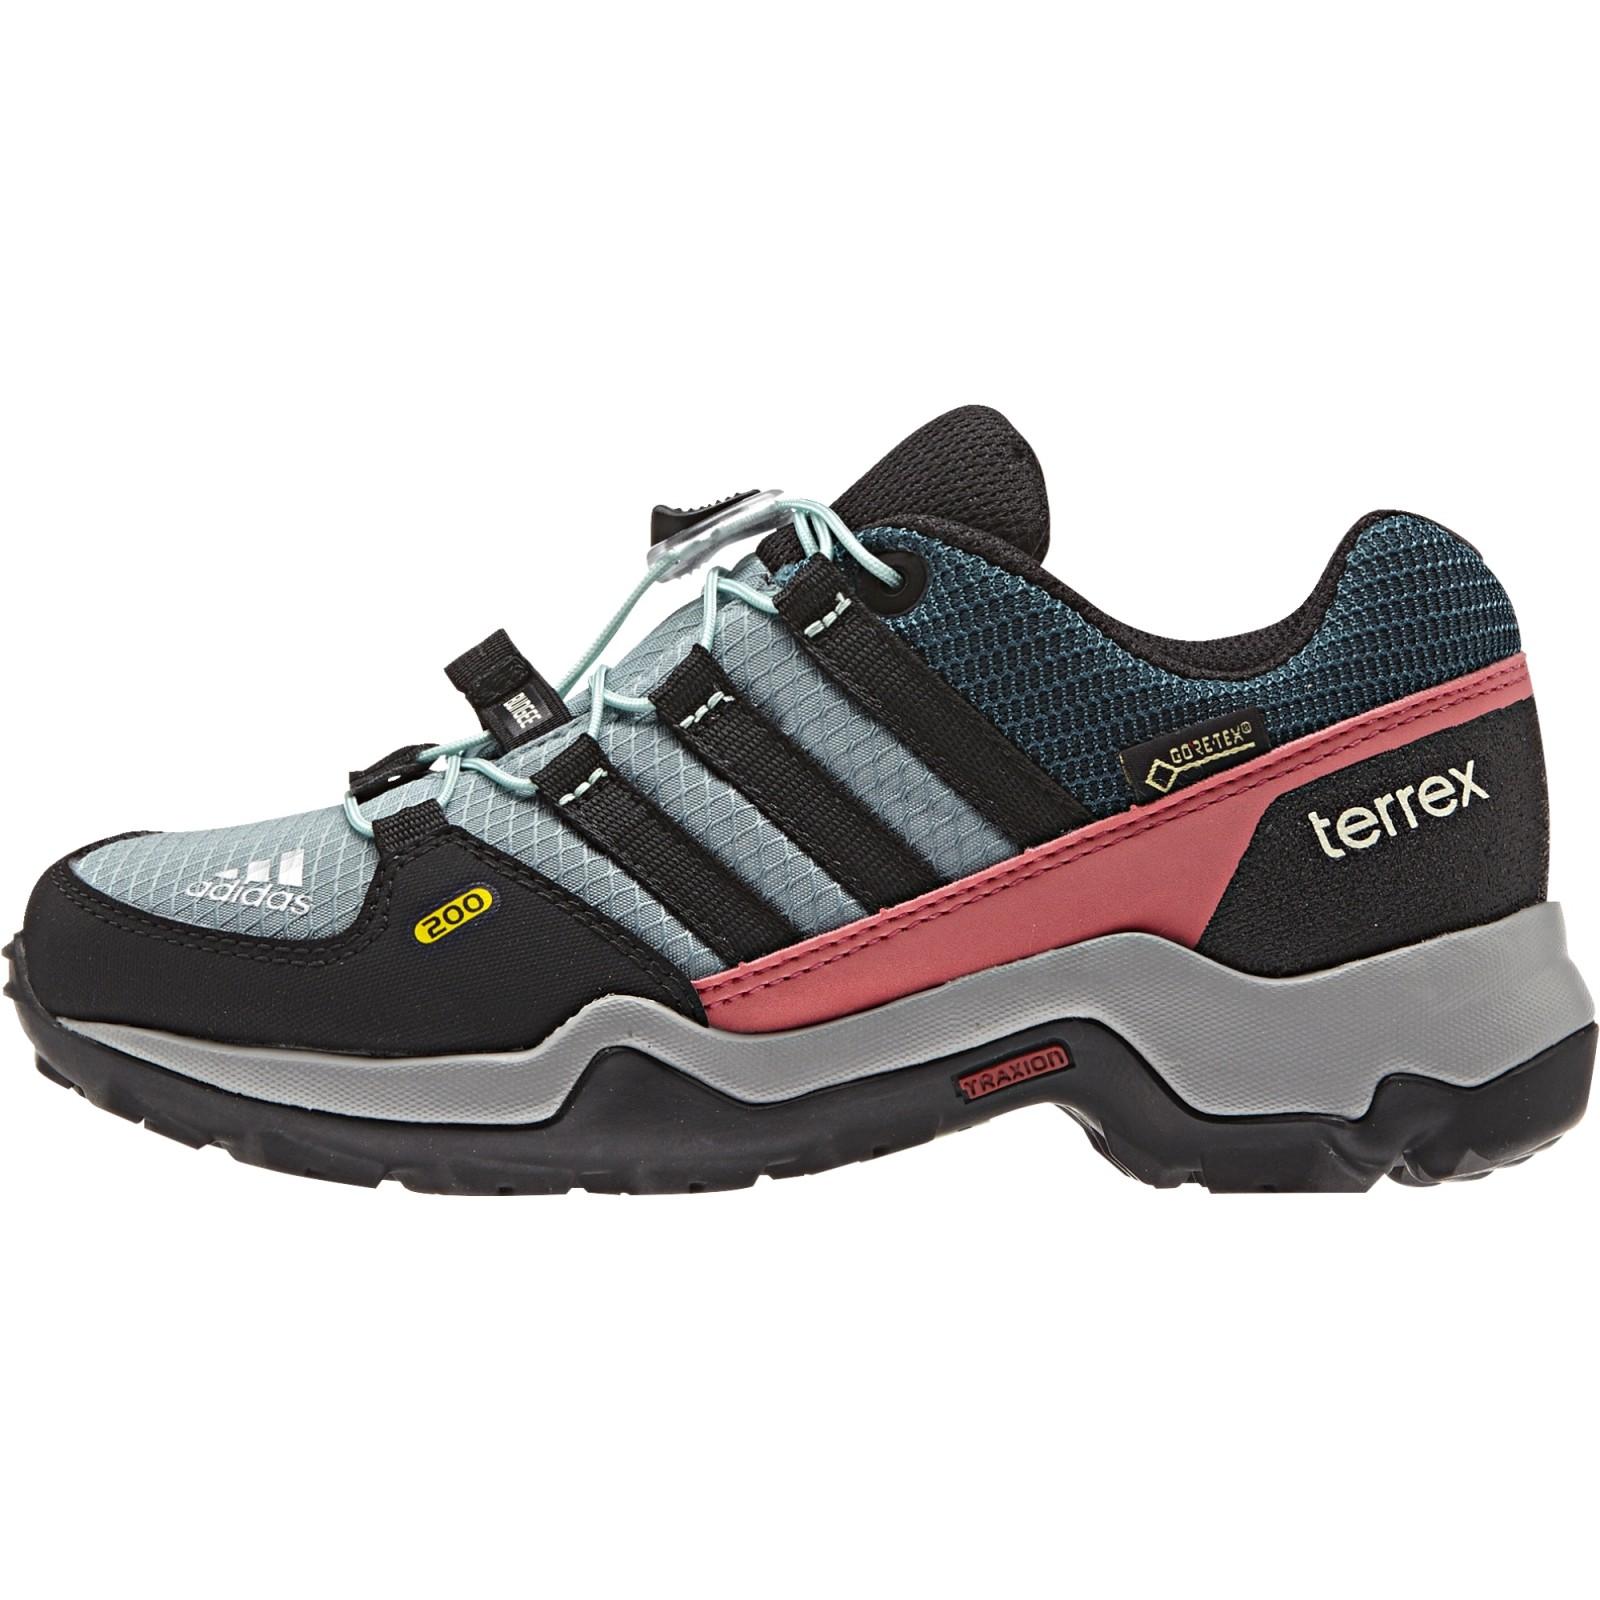 Dětská treková obuv adidas Performance TERREX GTX K VAPSTE CBLACK TECGRN. 1 65374b5e3f3